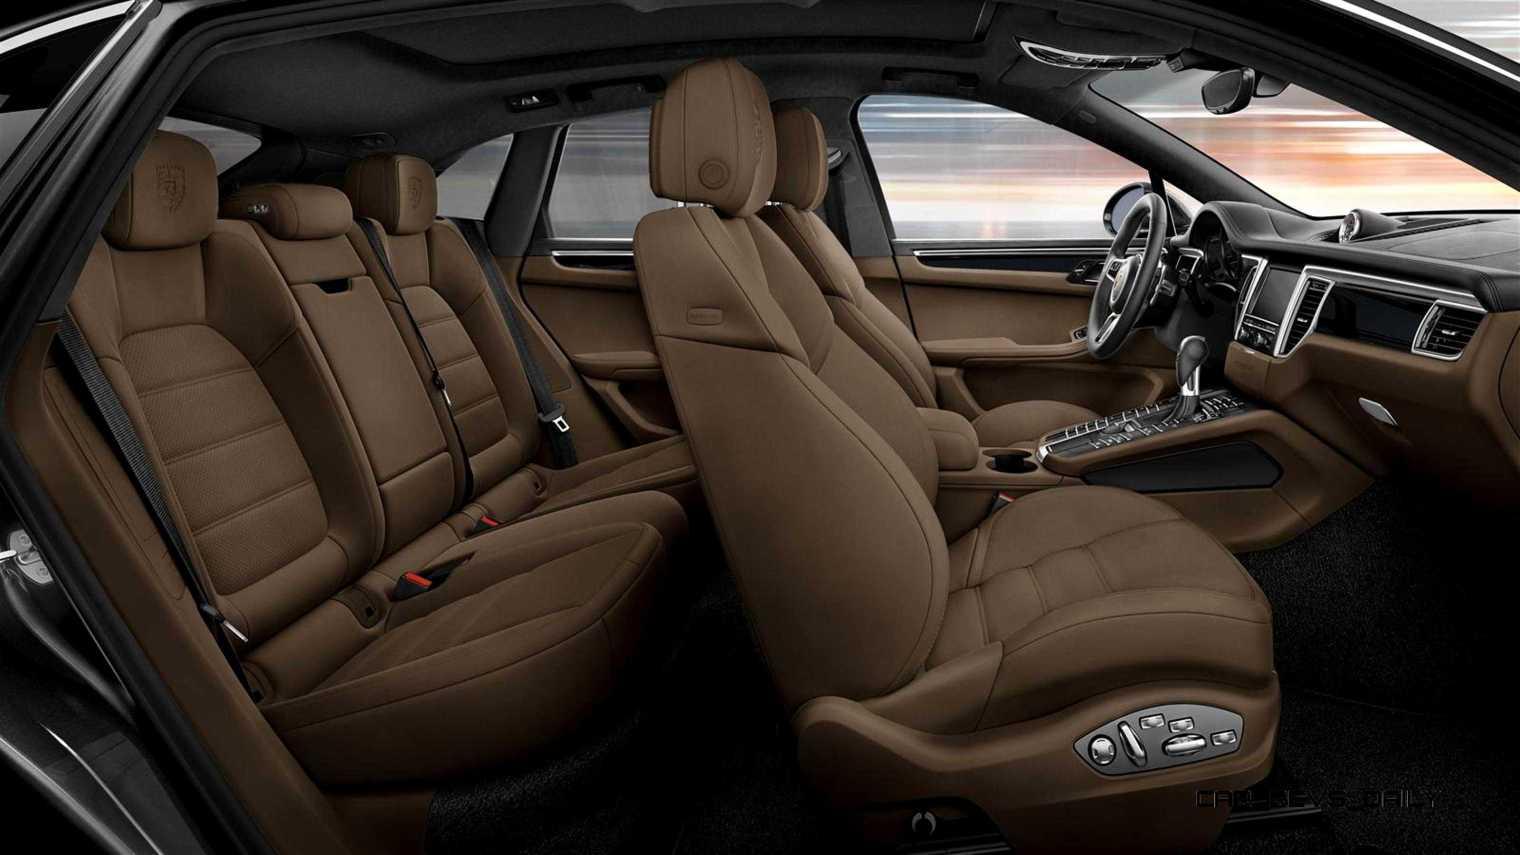 2015 Porsche Macan - Latest Images - CarRevsDaily.com 66